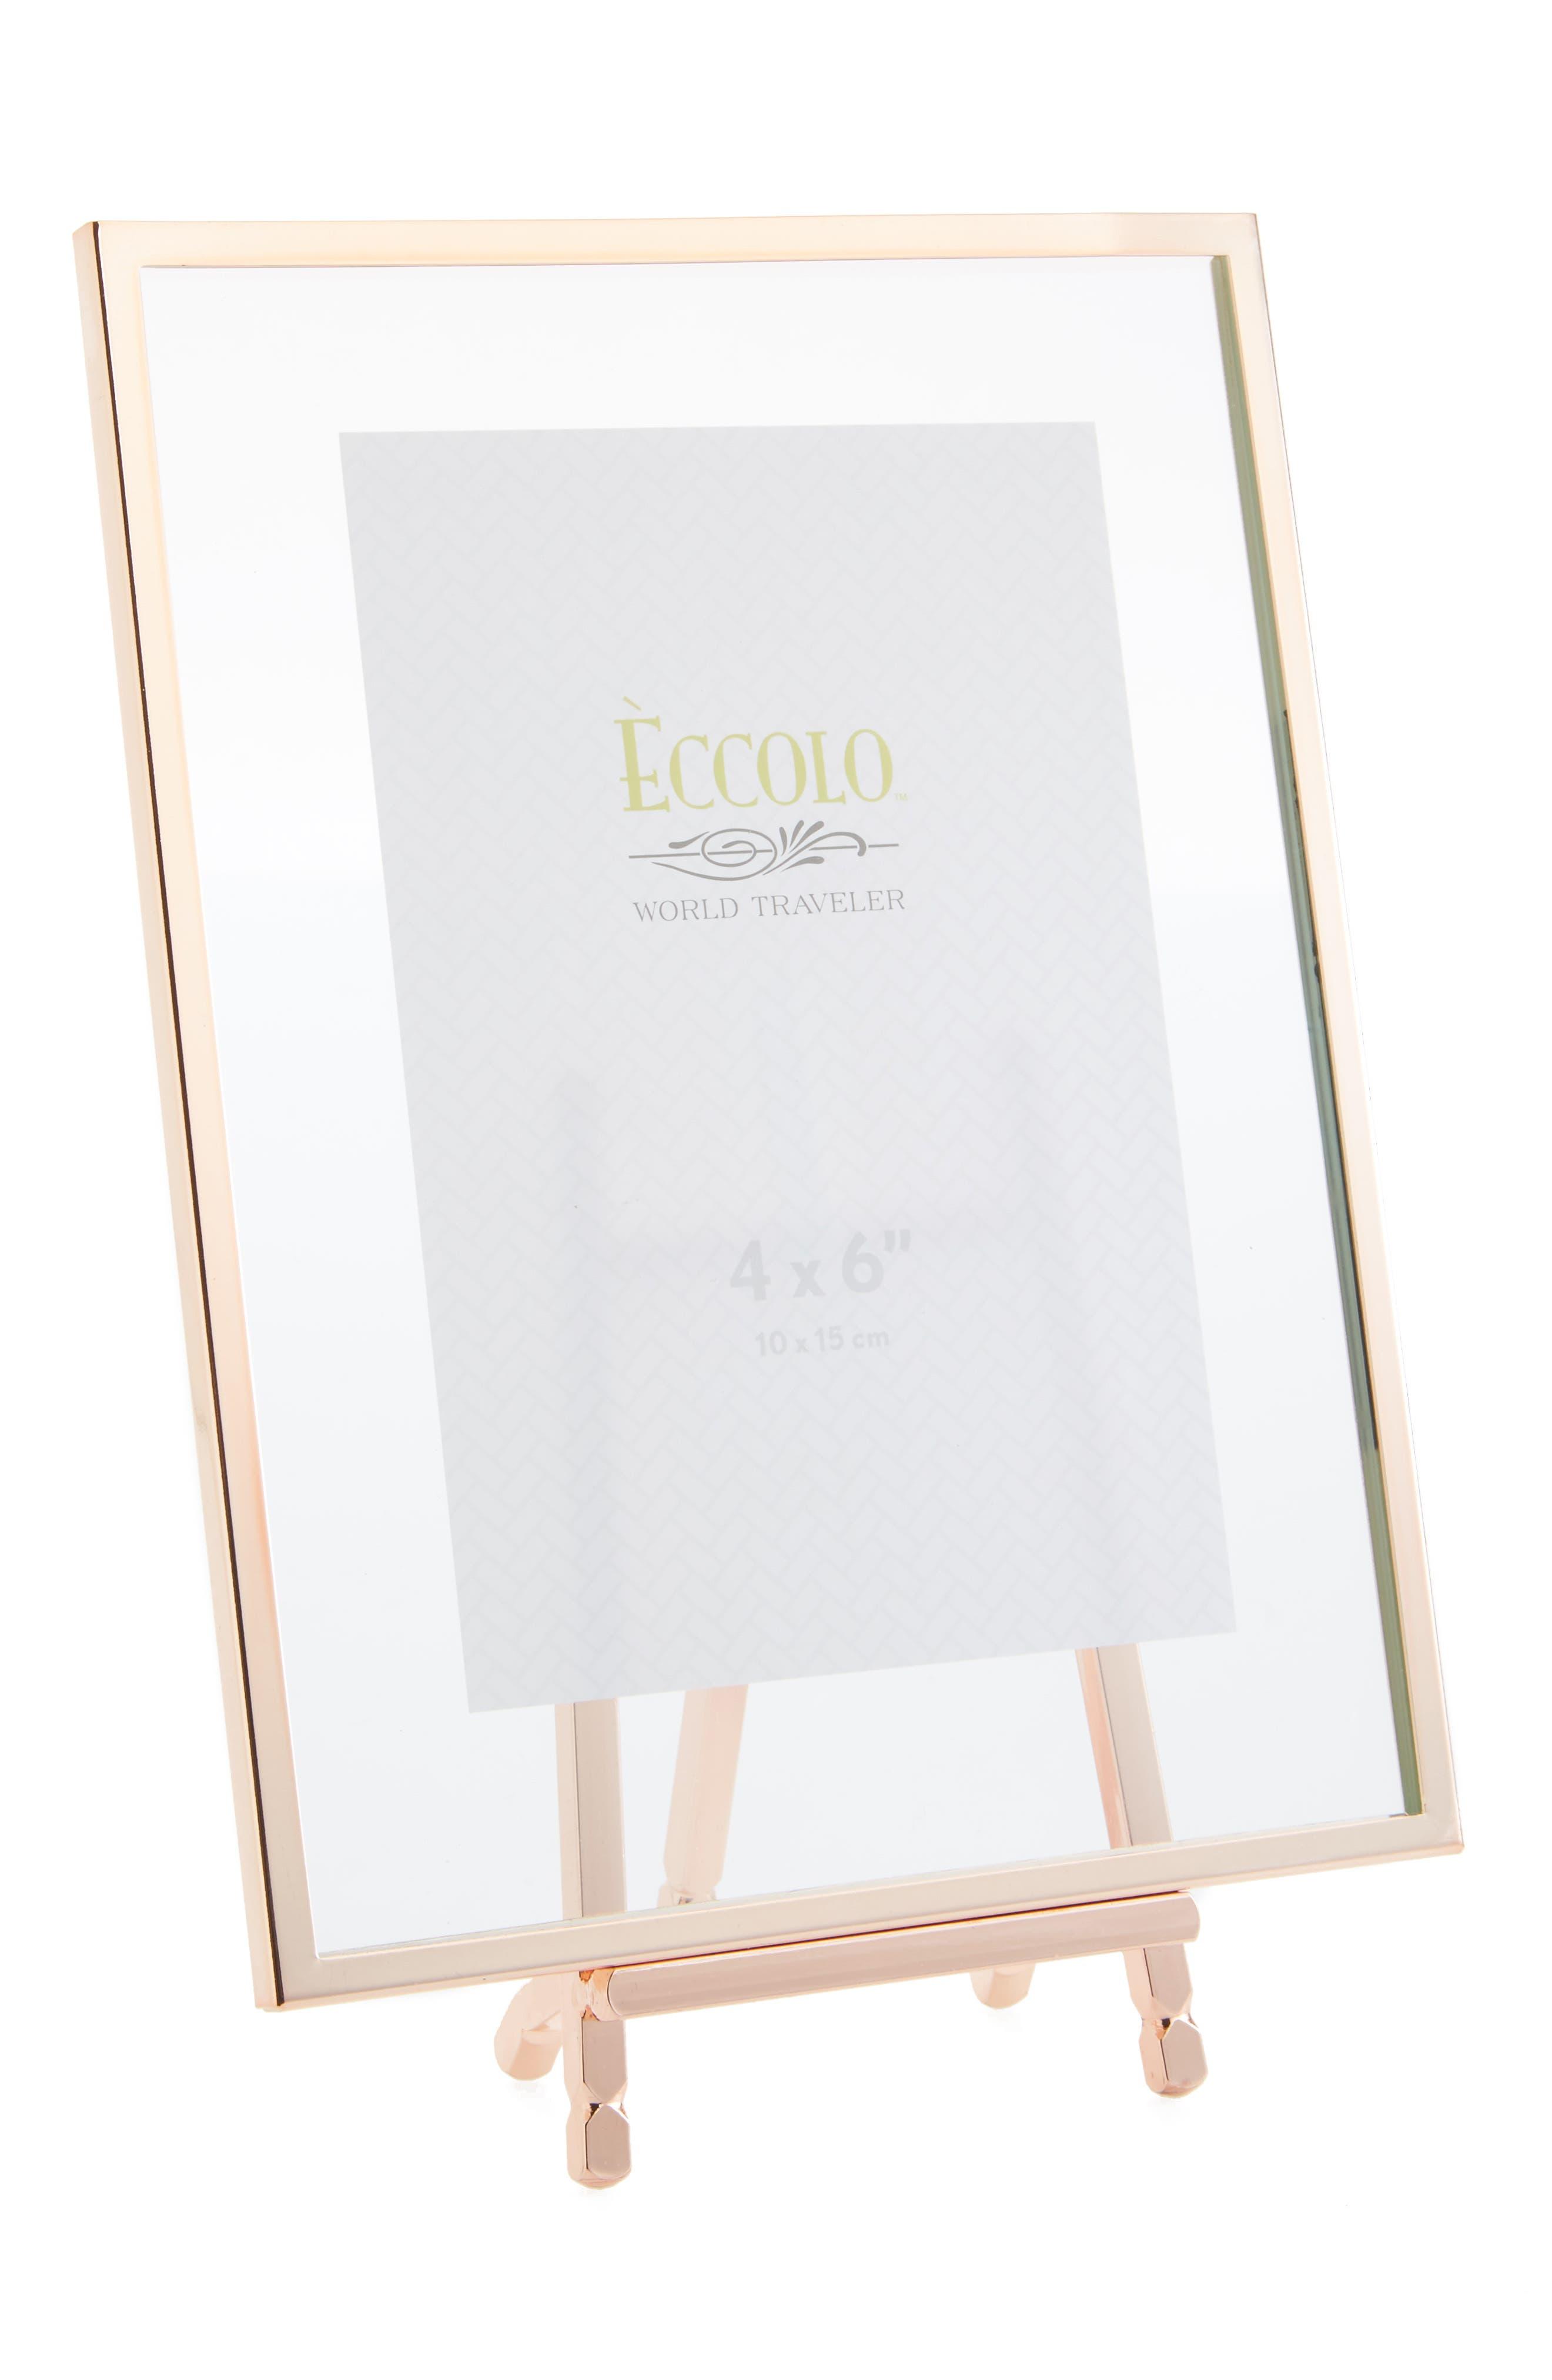 Eccolo Copper Easel Picture Frame